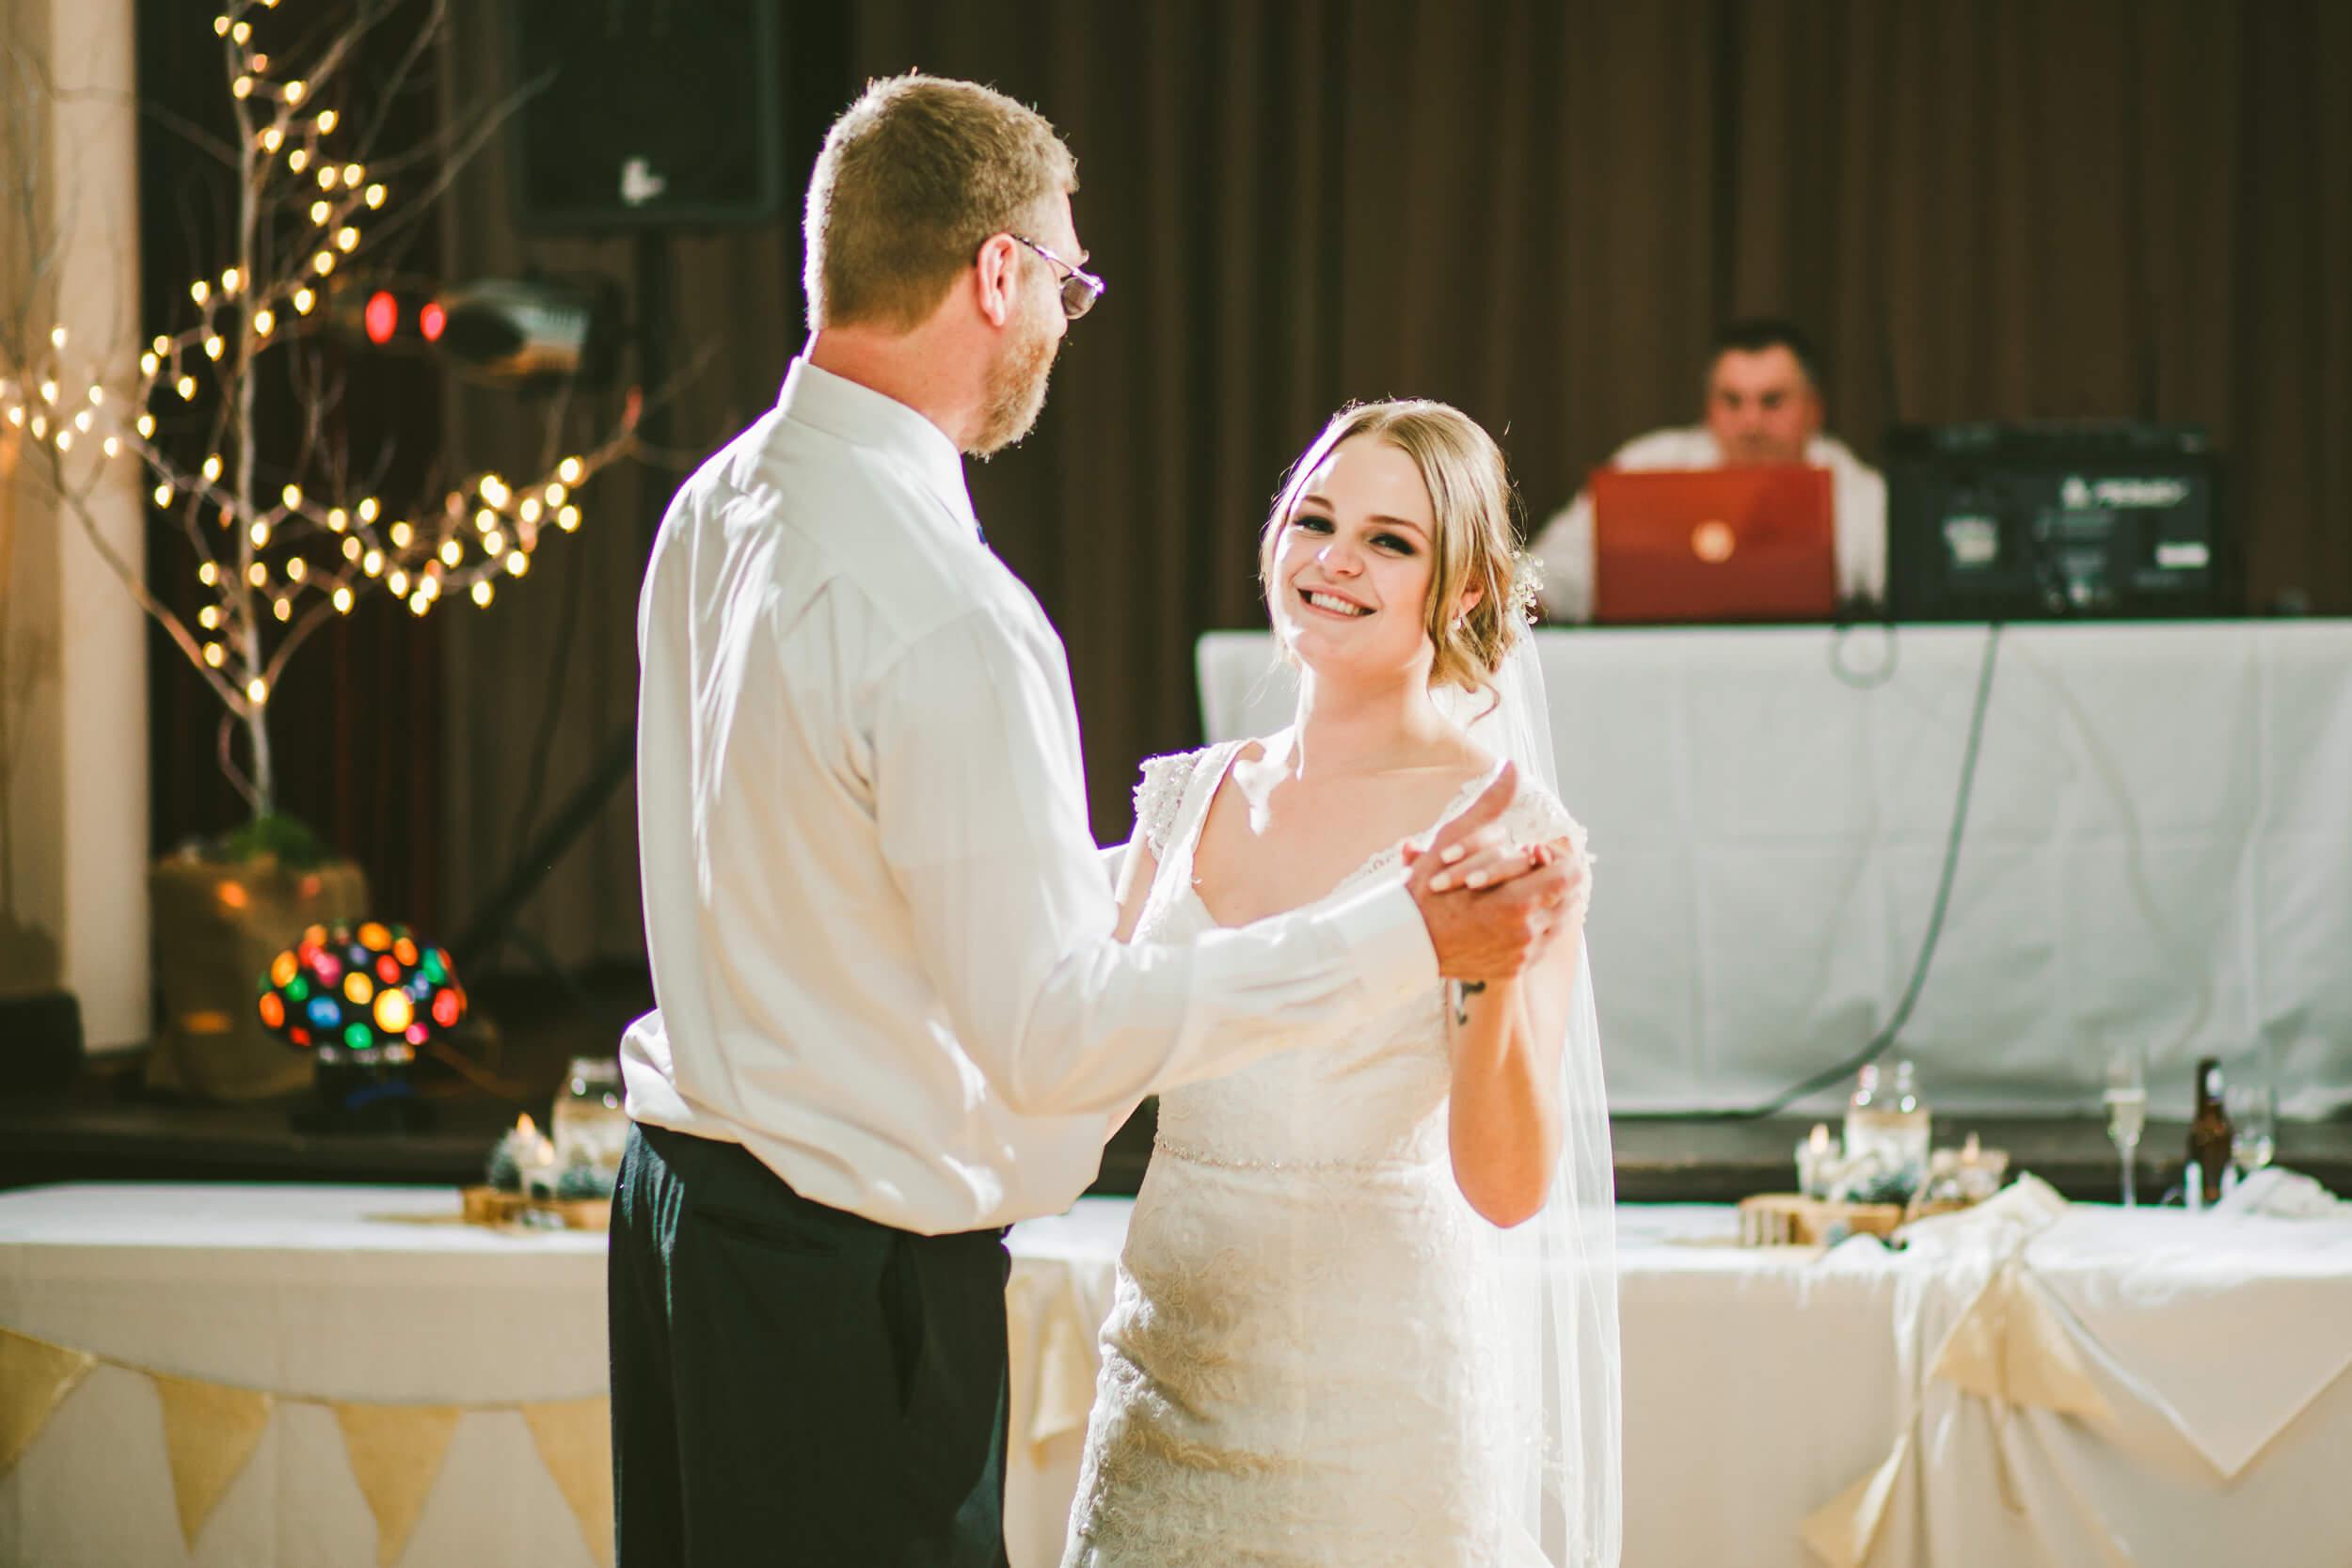 mukogawa winter wedding in spokane (288).jpg